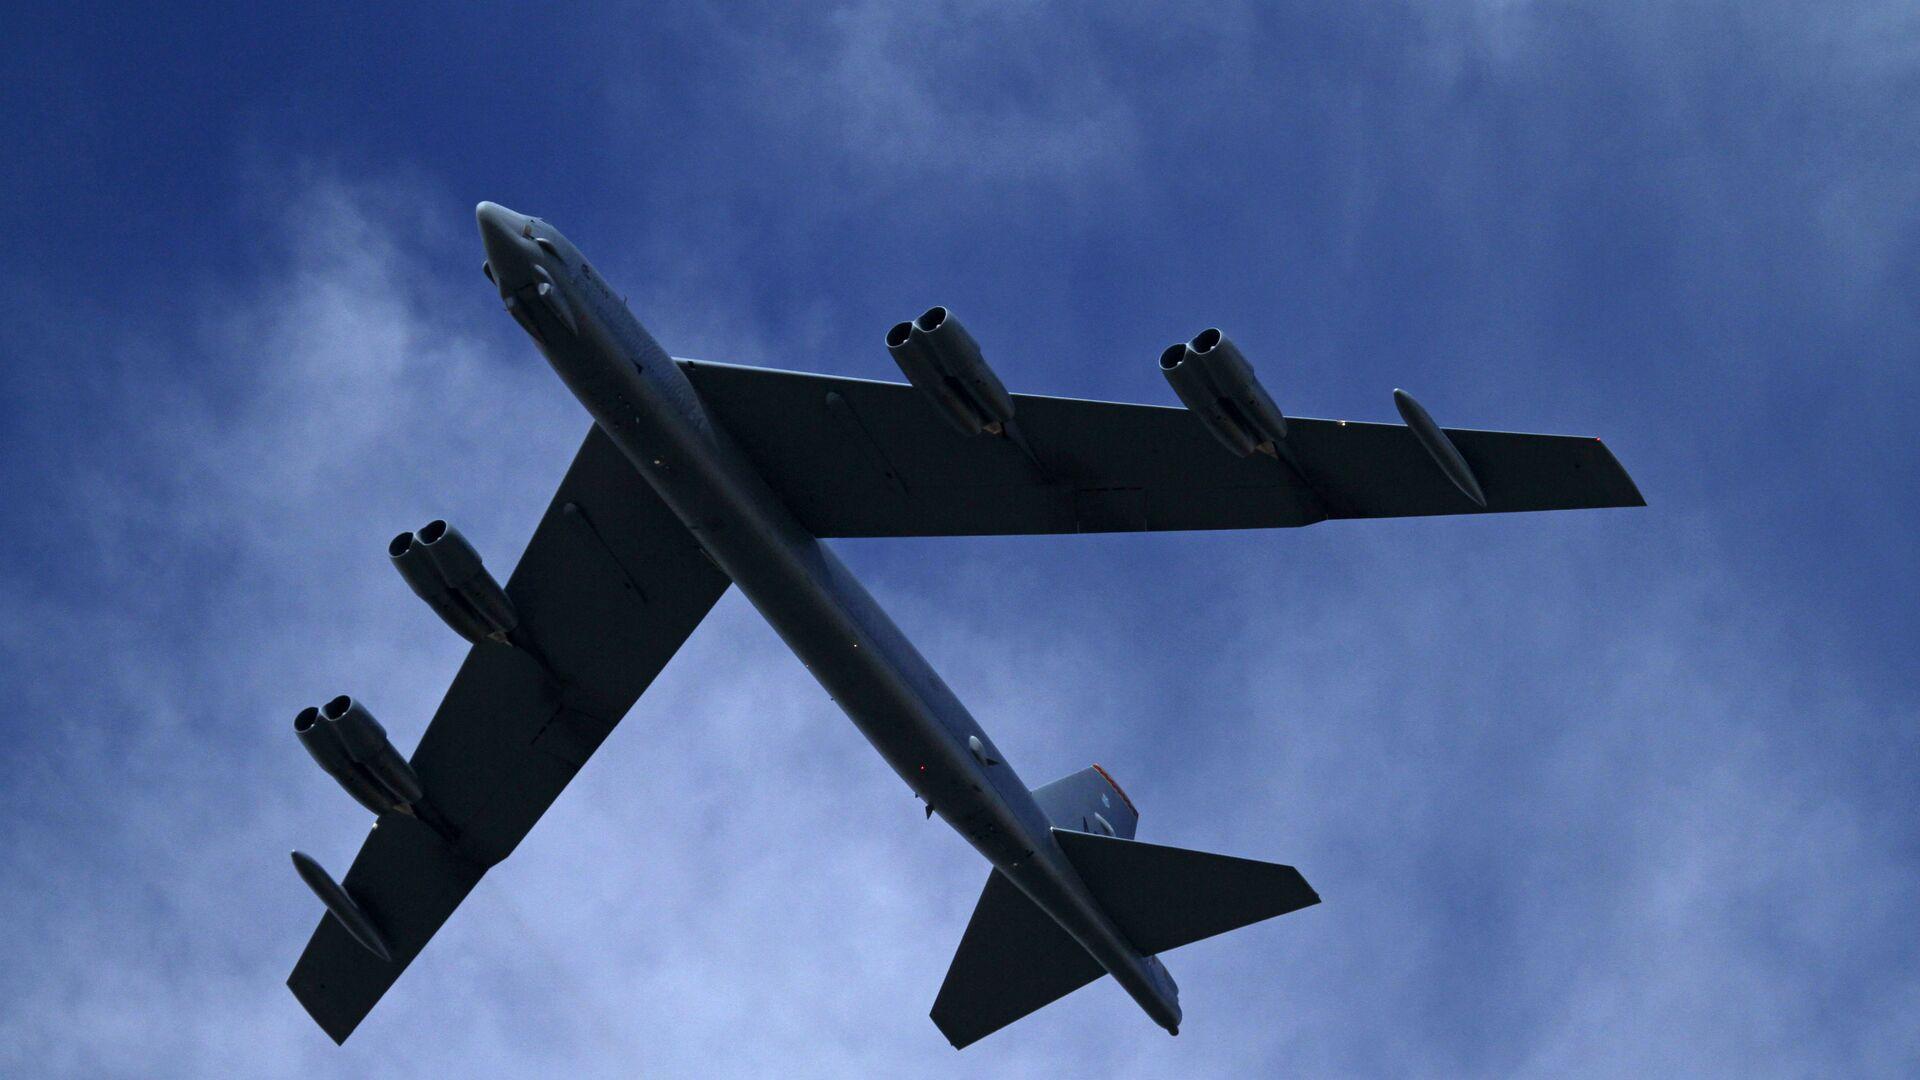 Bombardiere strategico B-52H - Sputnik Italia, 1920, 07.08.2021